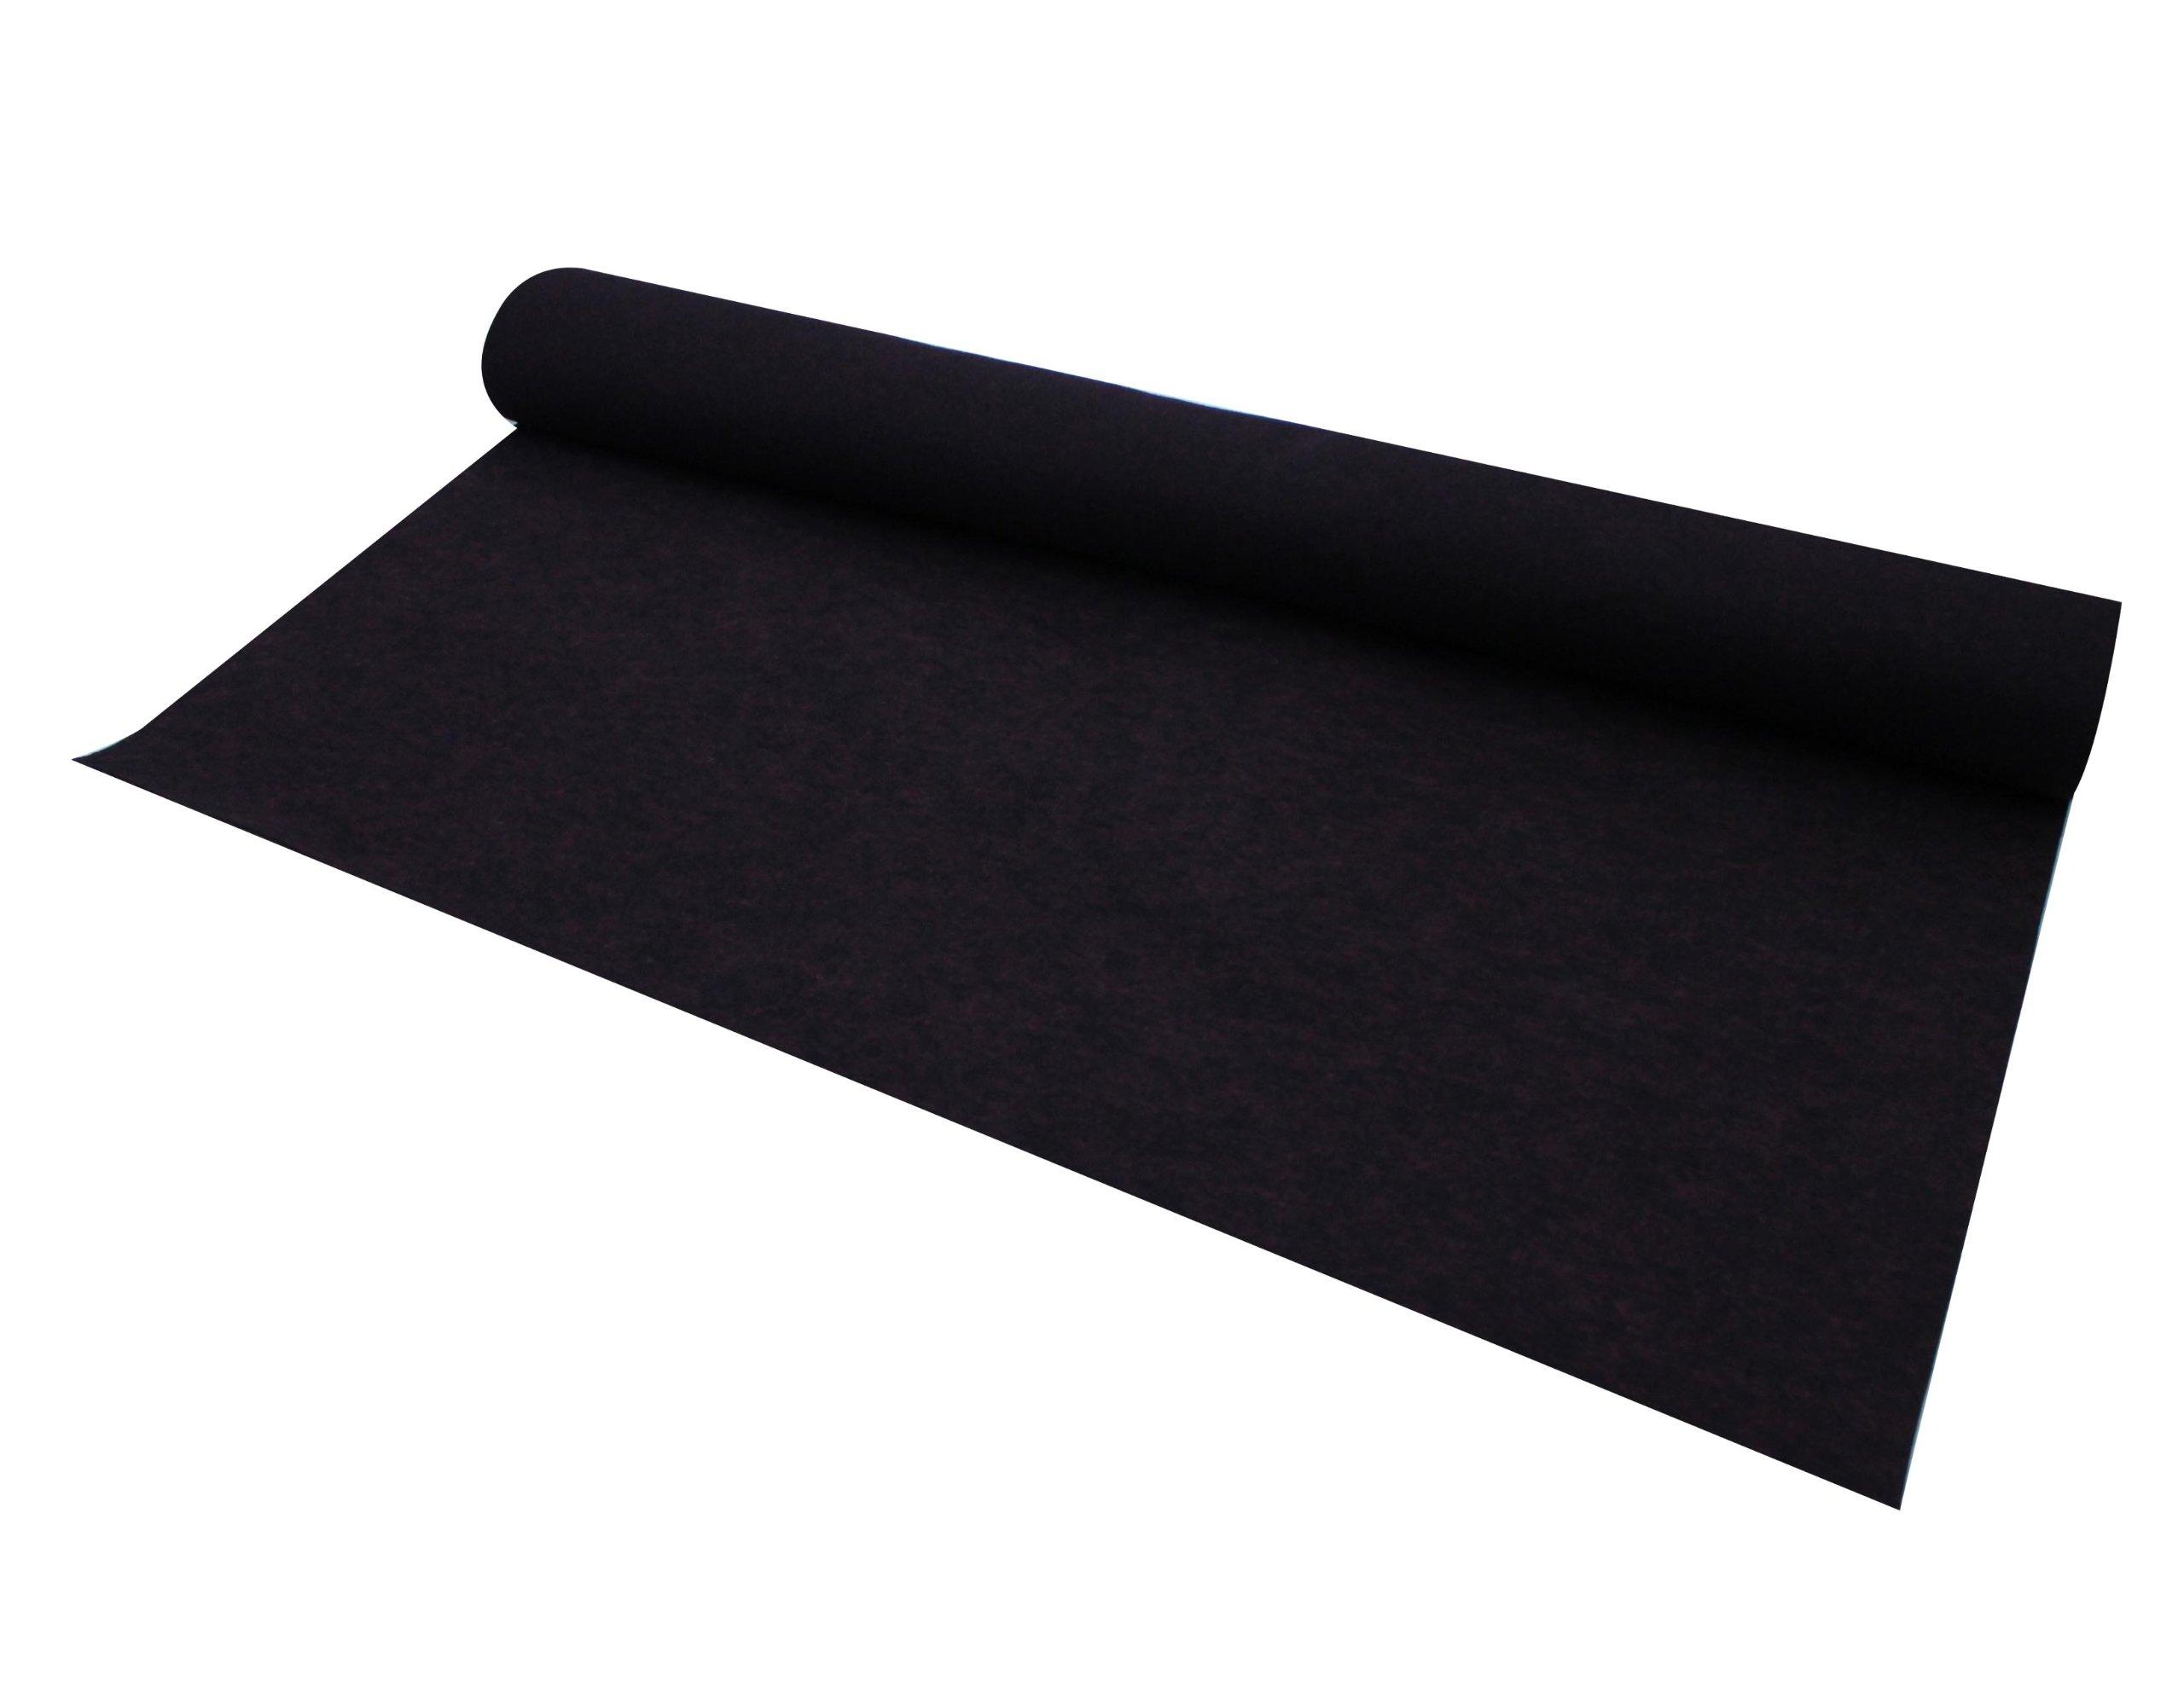 Absolute C10RD 10-Feet Long/4-Feet Wide Carpet for Speaker Sub Box, RV Truck Car/Trunk Laner (Red)